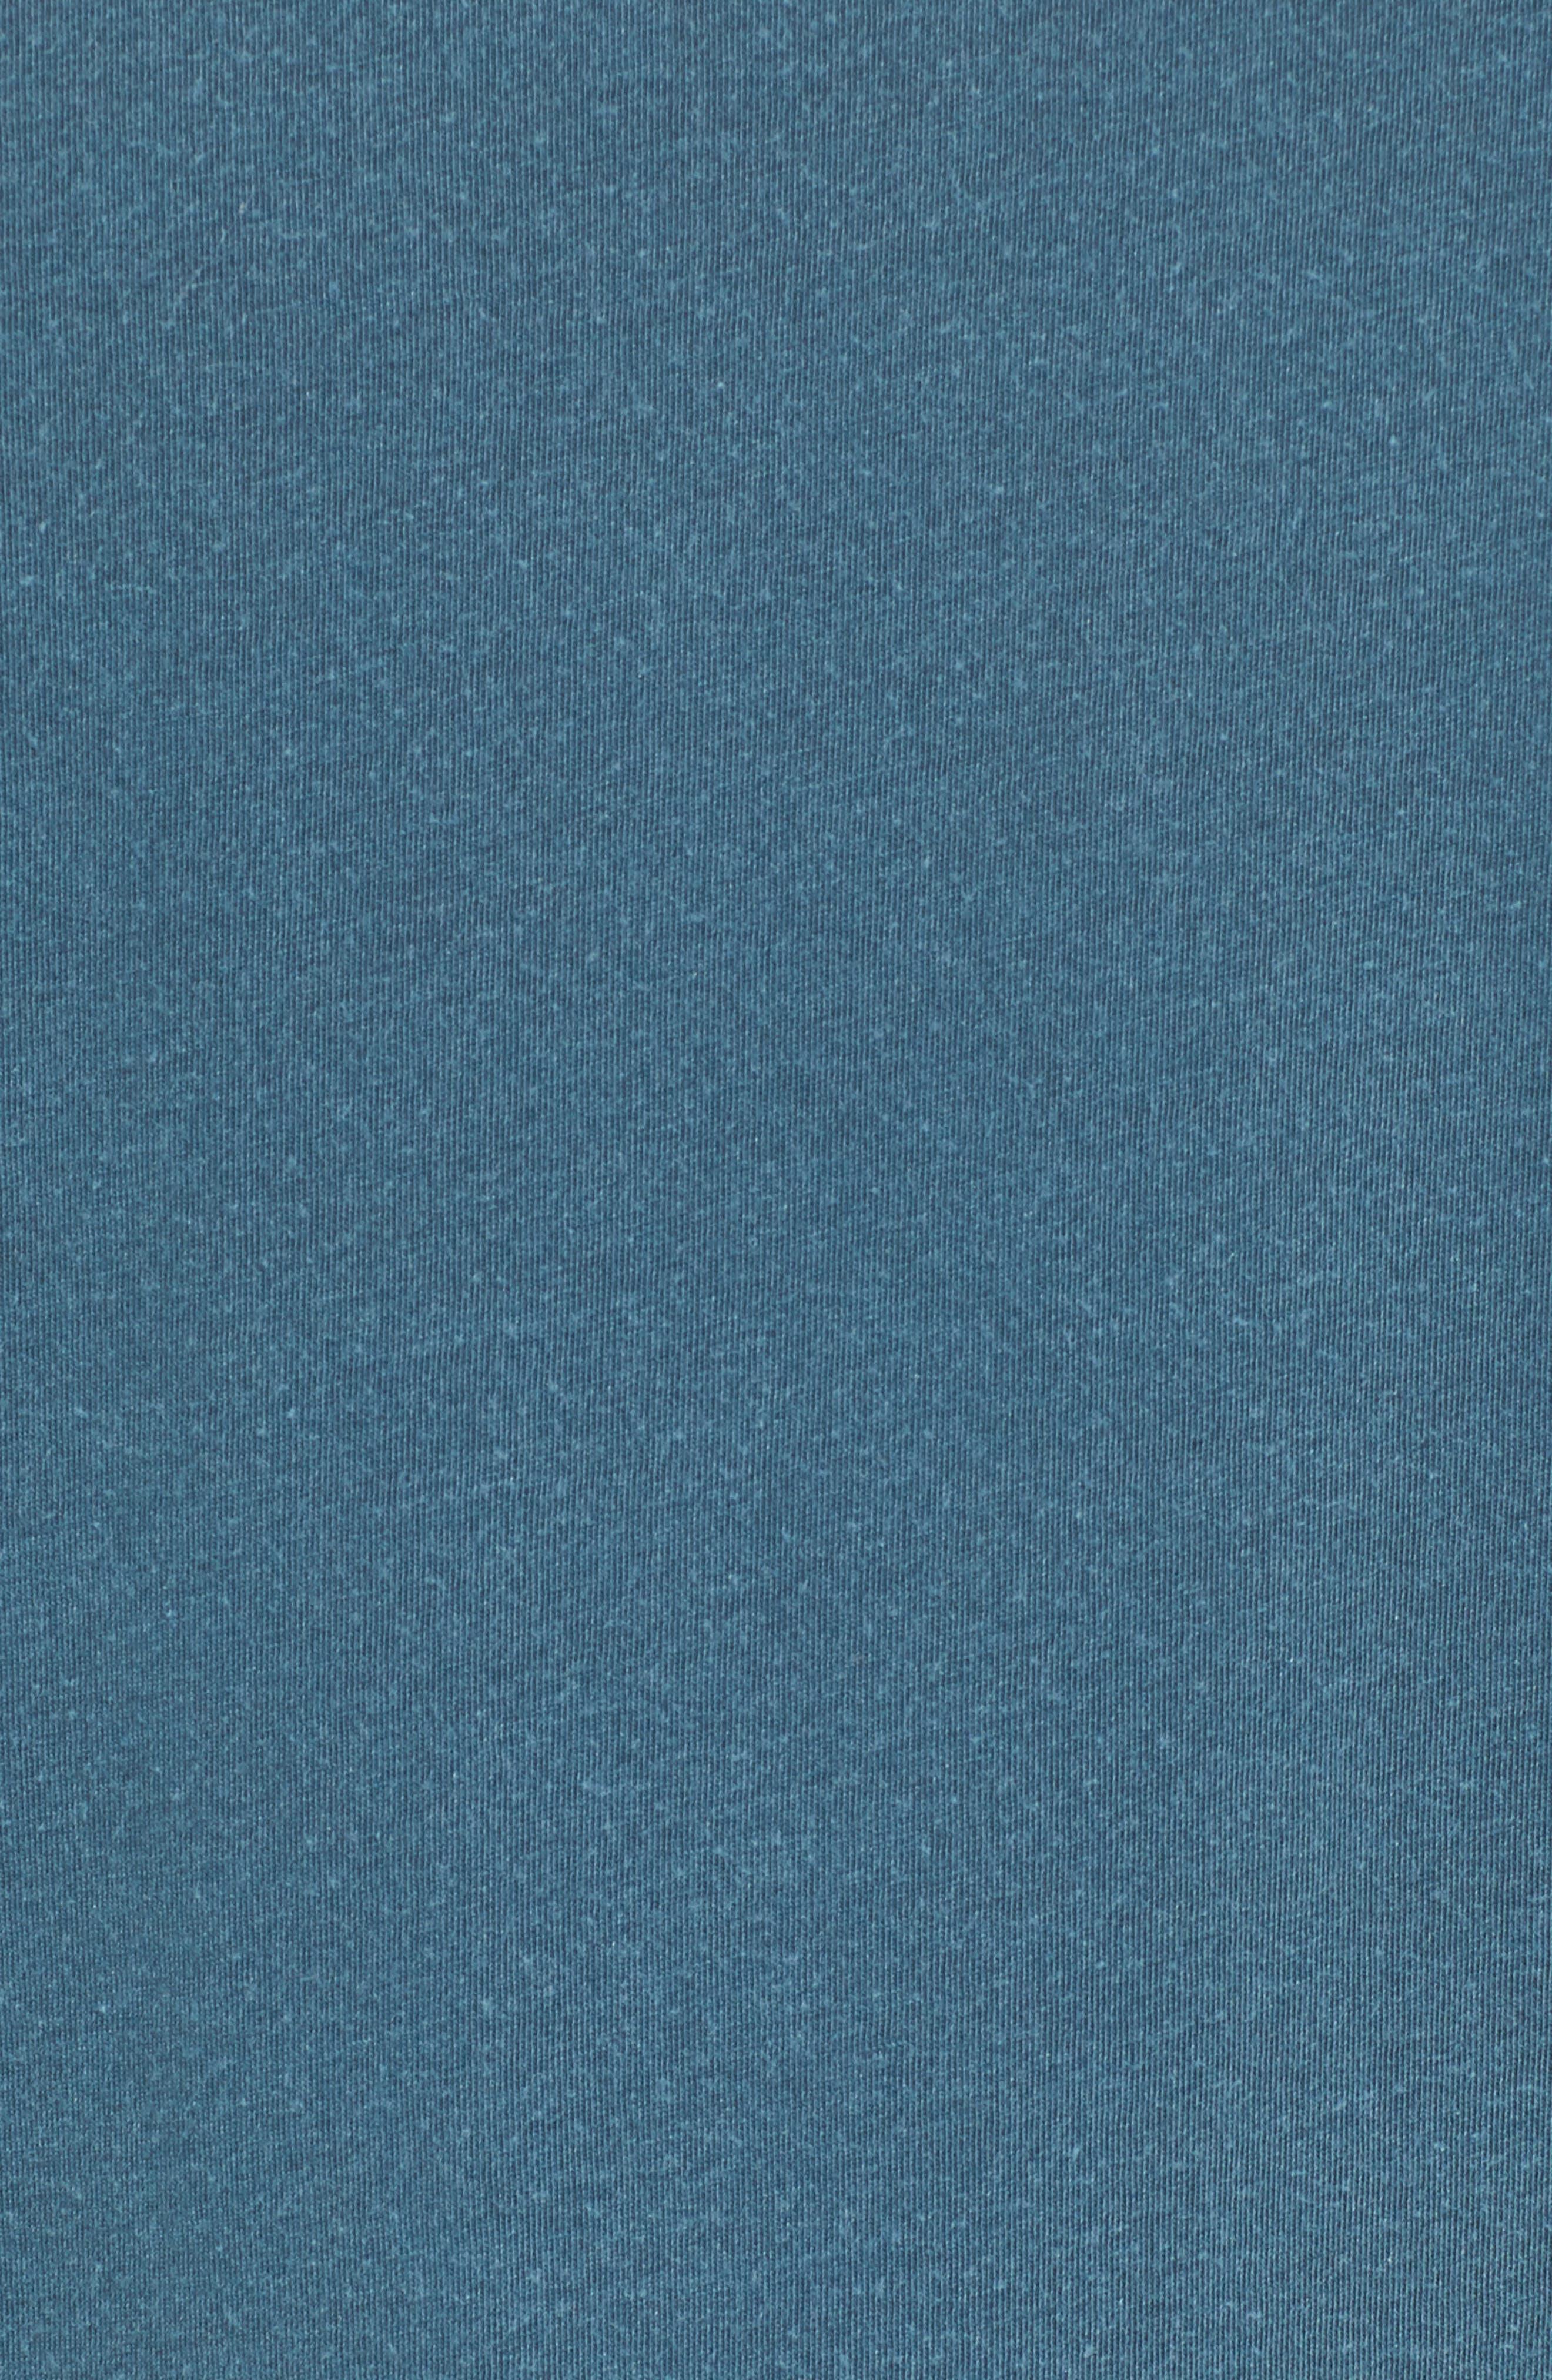 Slim Fit Scoop Neck T-Shirt,                             Alternate thumbnail 5, color,                             449